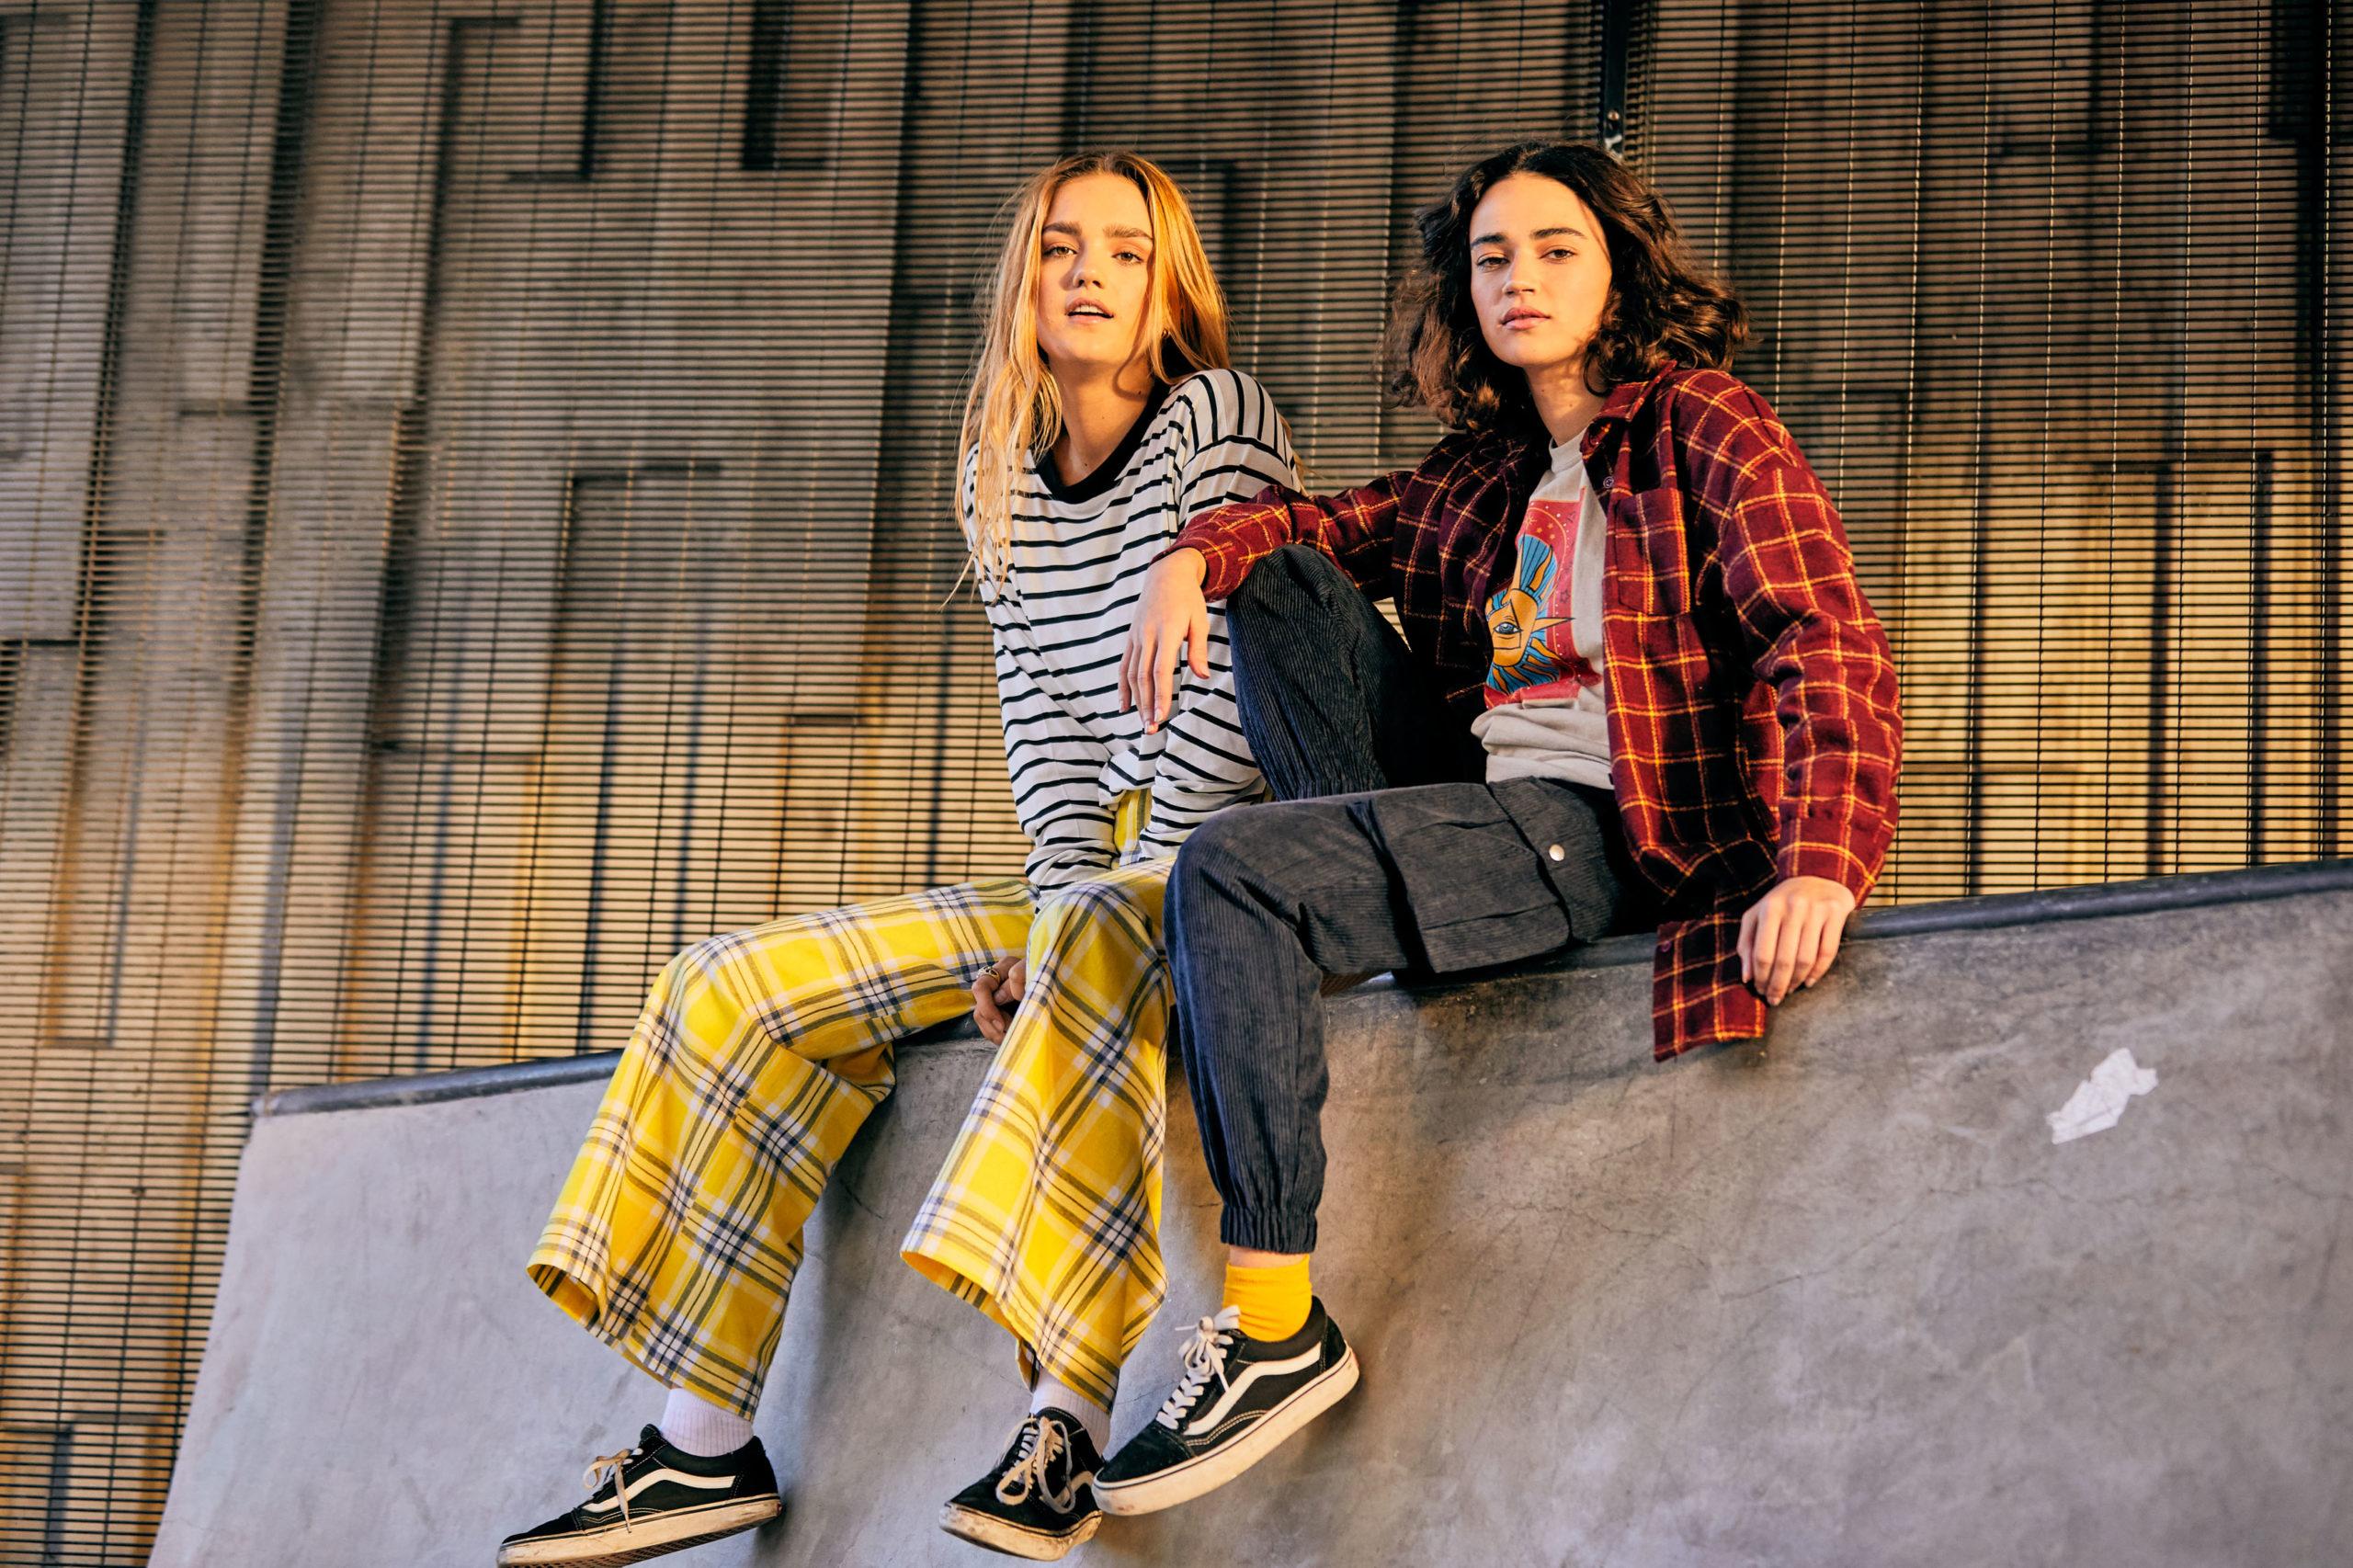 Daisy street fashion